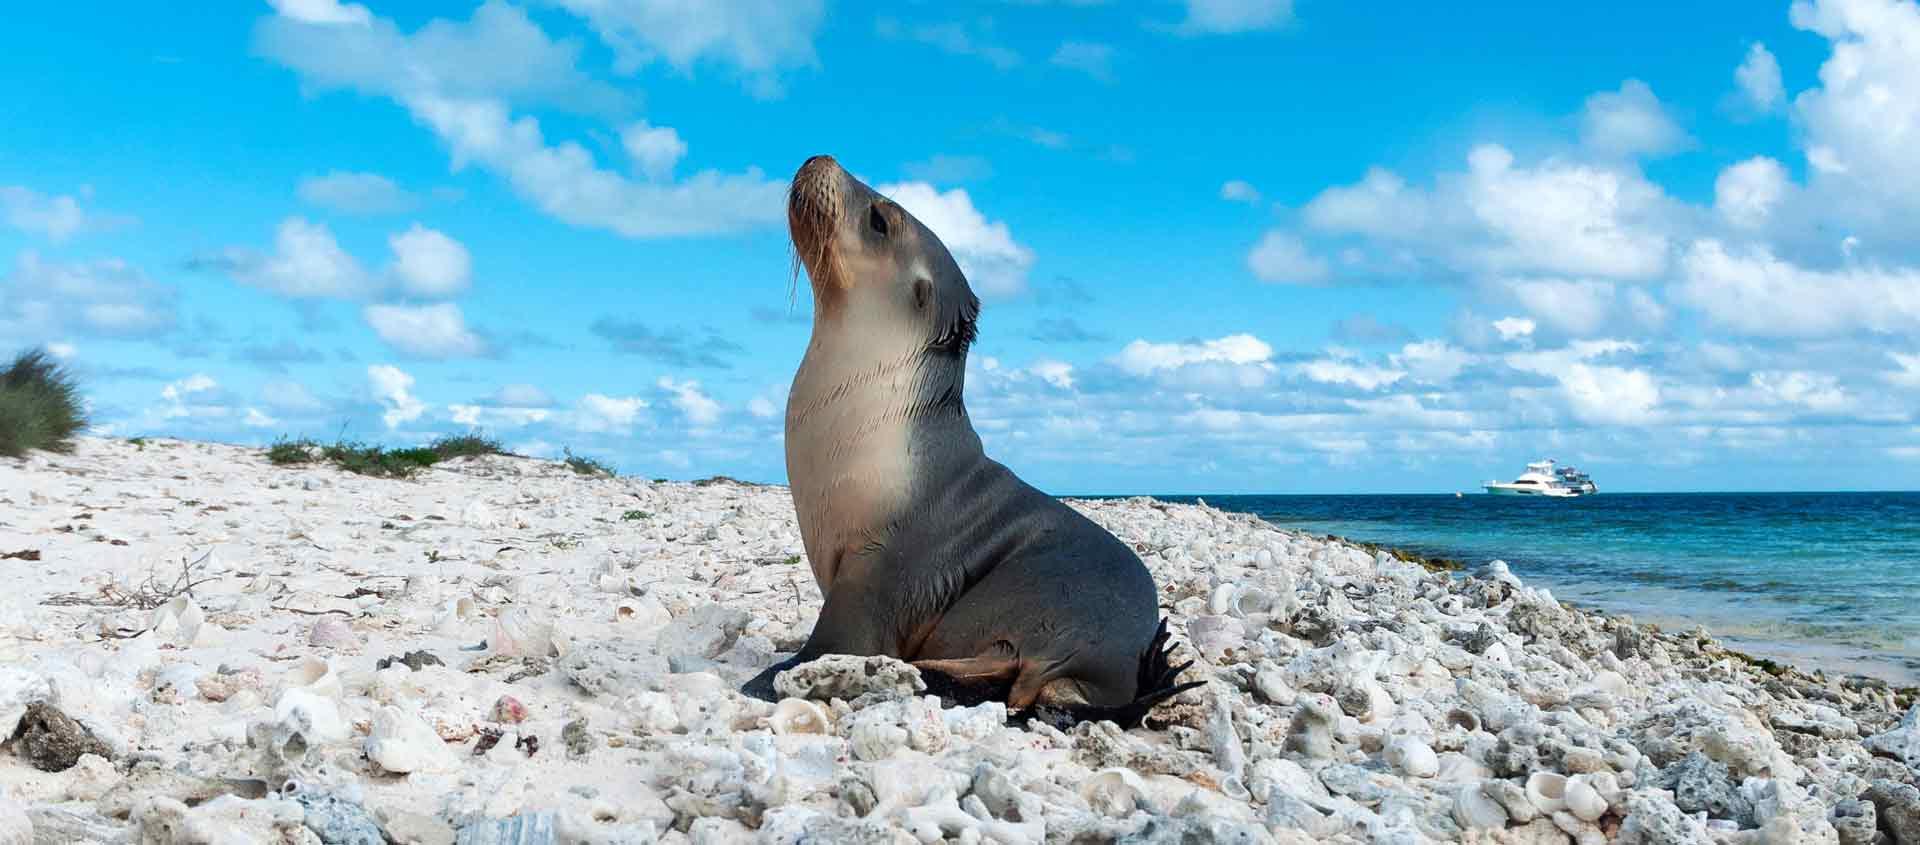 cruise australia west coast image of Australian Sea Lion at Abrolhos Islands